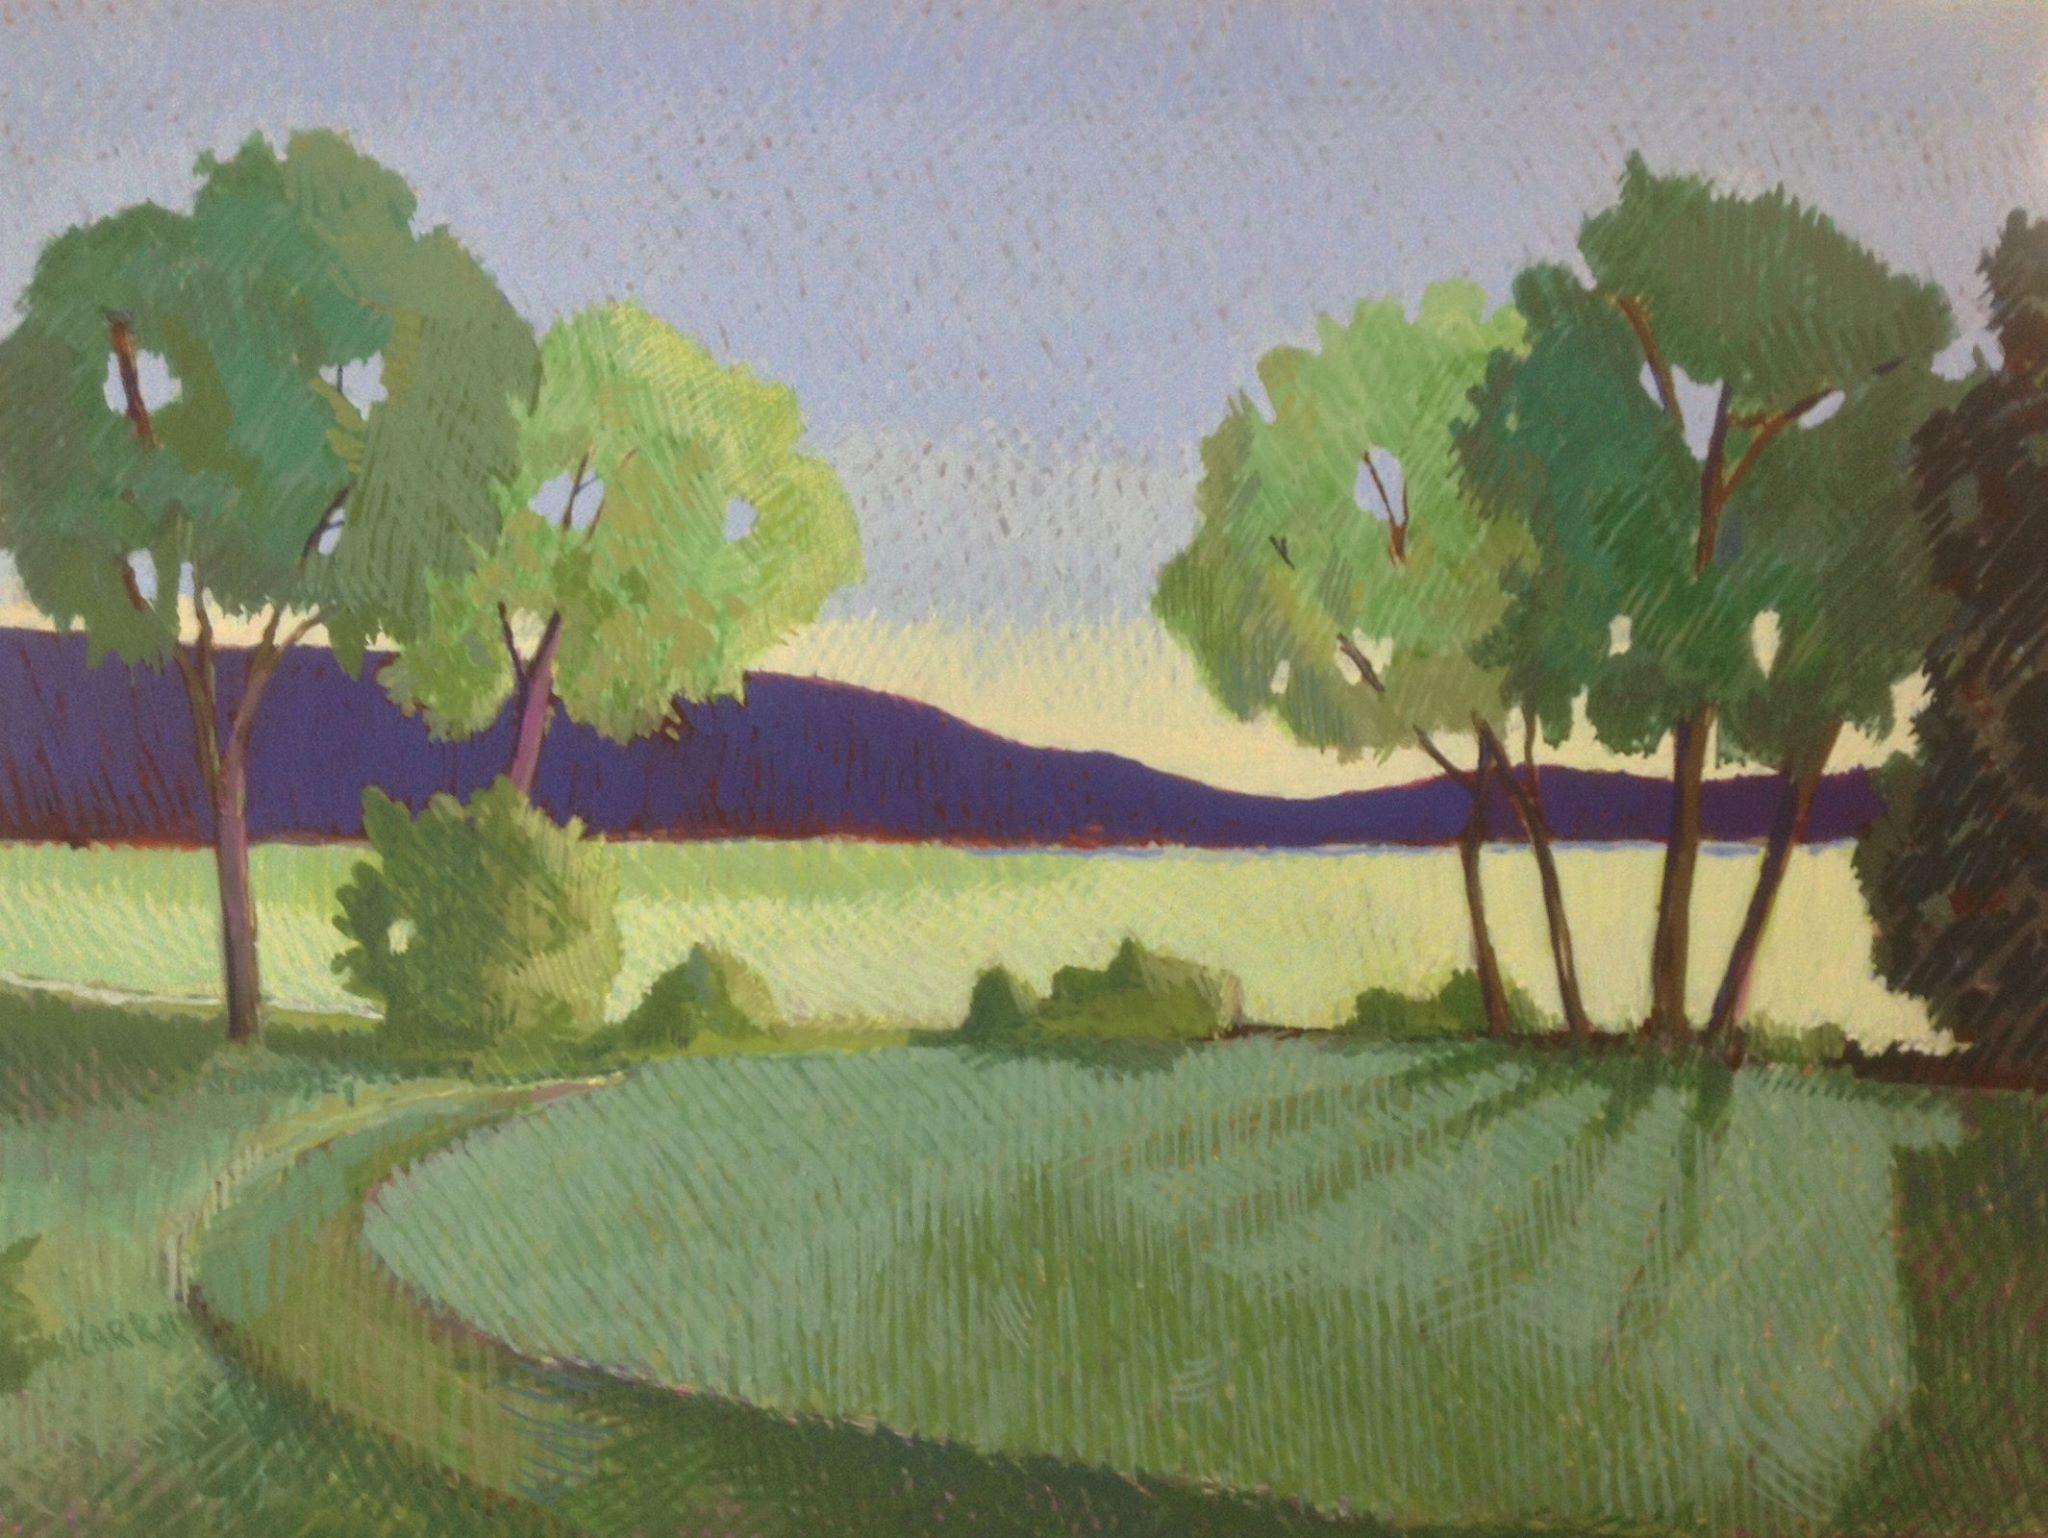 Sunrise 1 by Jane Carr